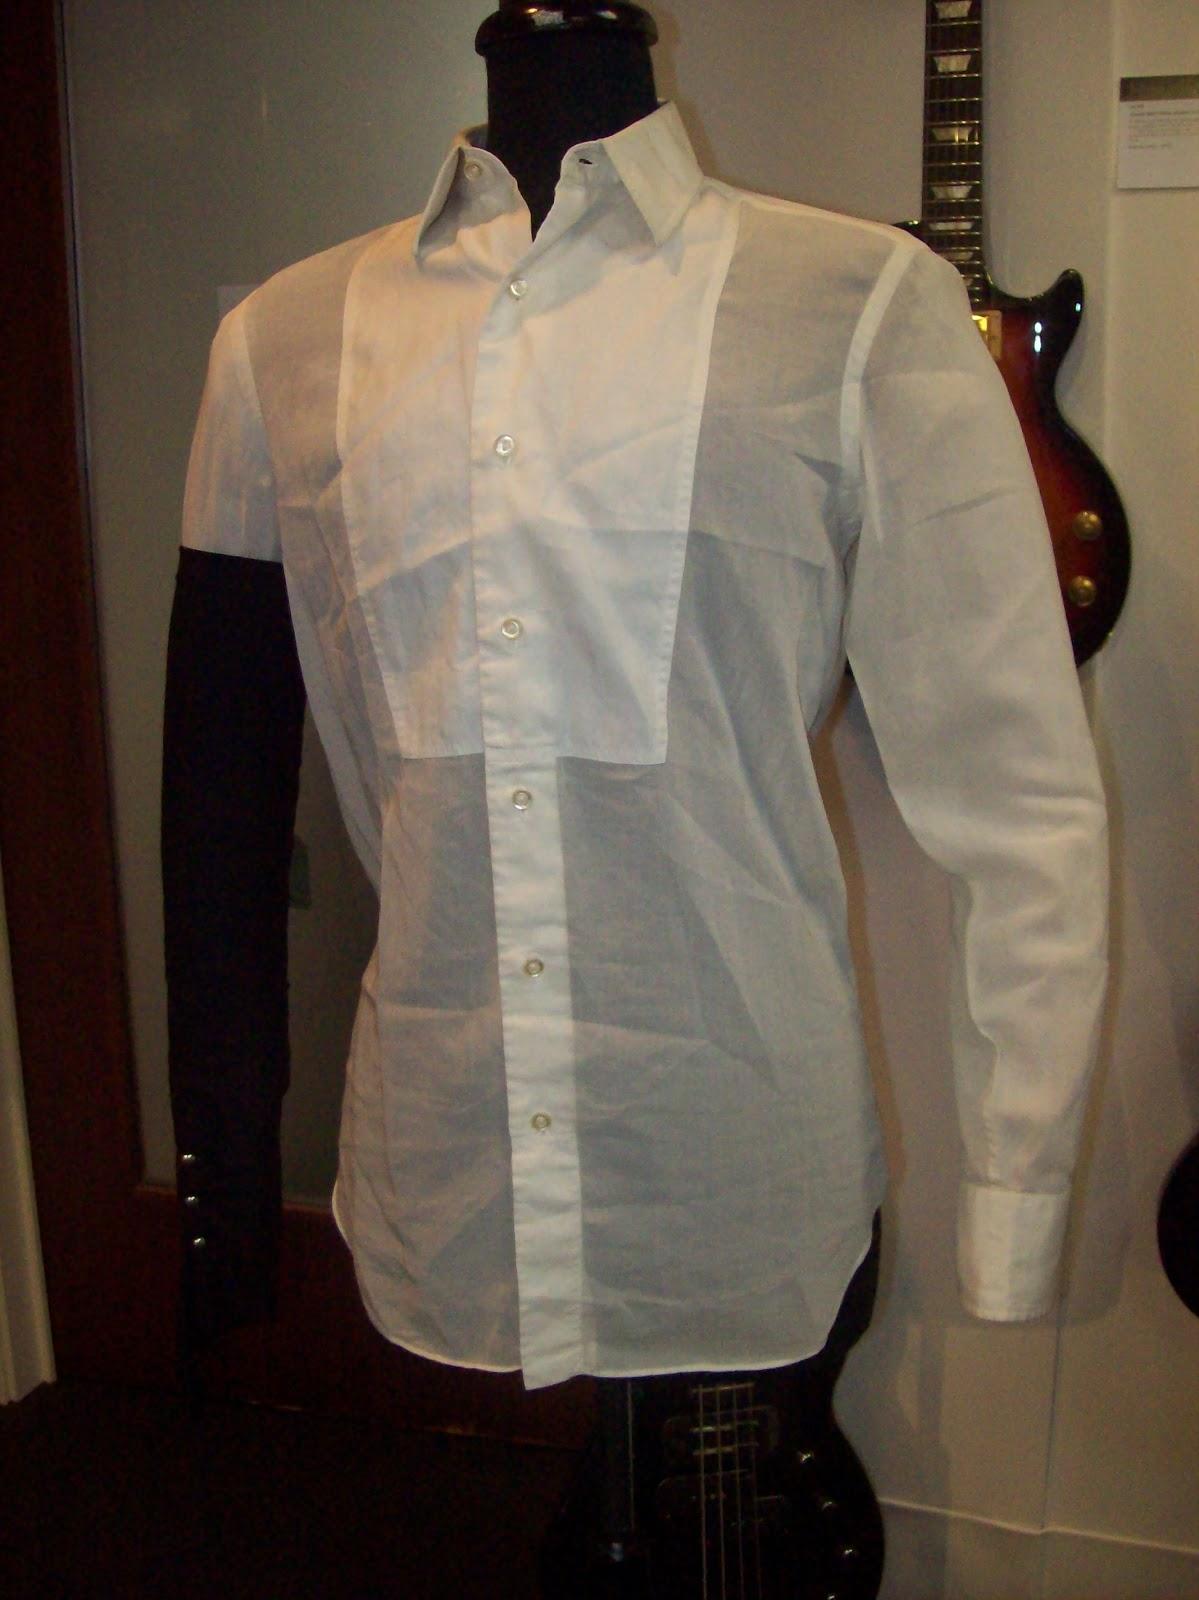 http://3.bp.blogspot.com/-6Nxv-QqSy08/UMPW5FZuuWI/AAAAAAAAB6s/PEOJY94IUS0/s1600/dd+shirt+.jpg